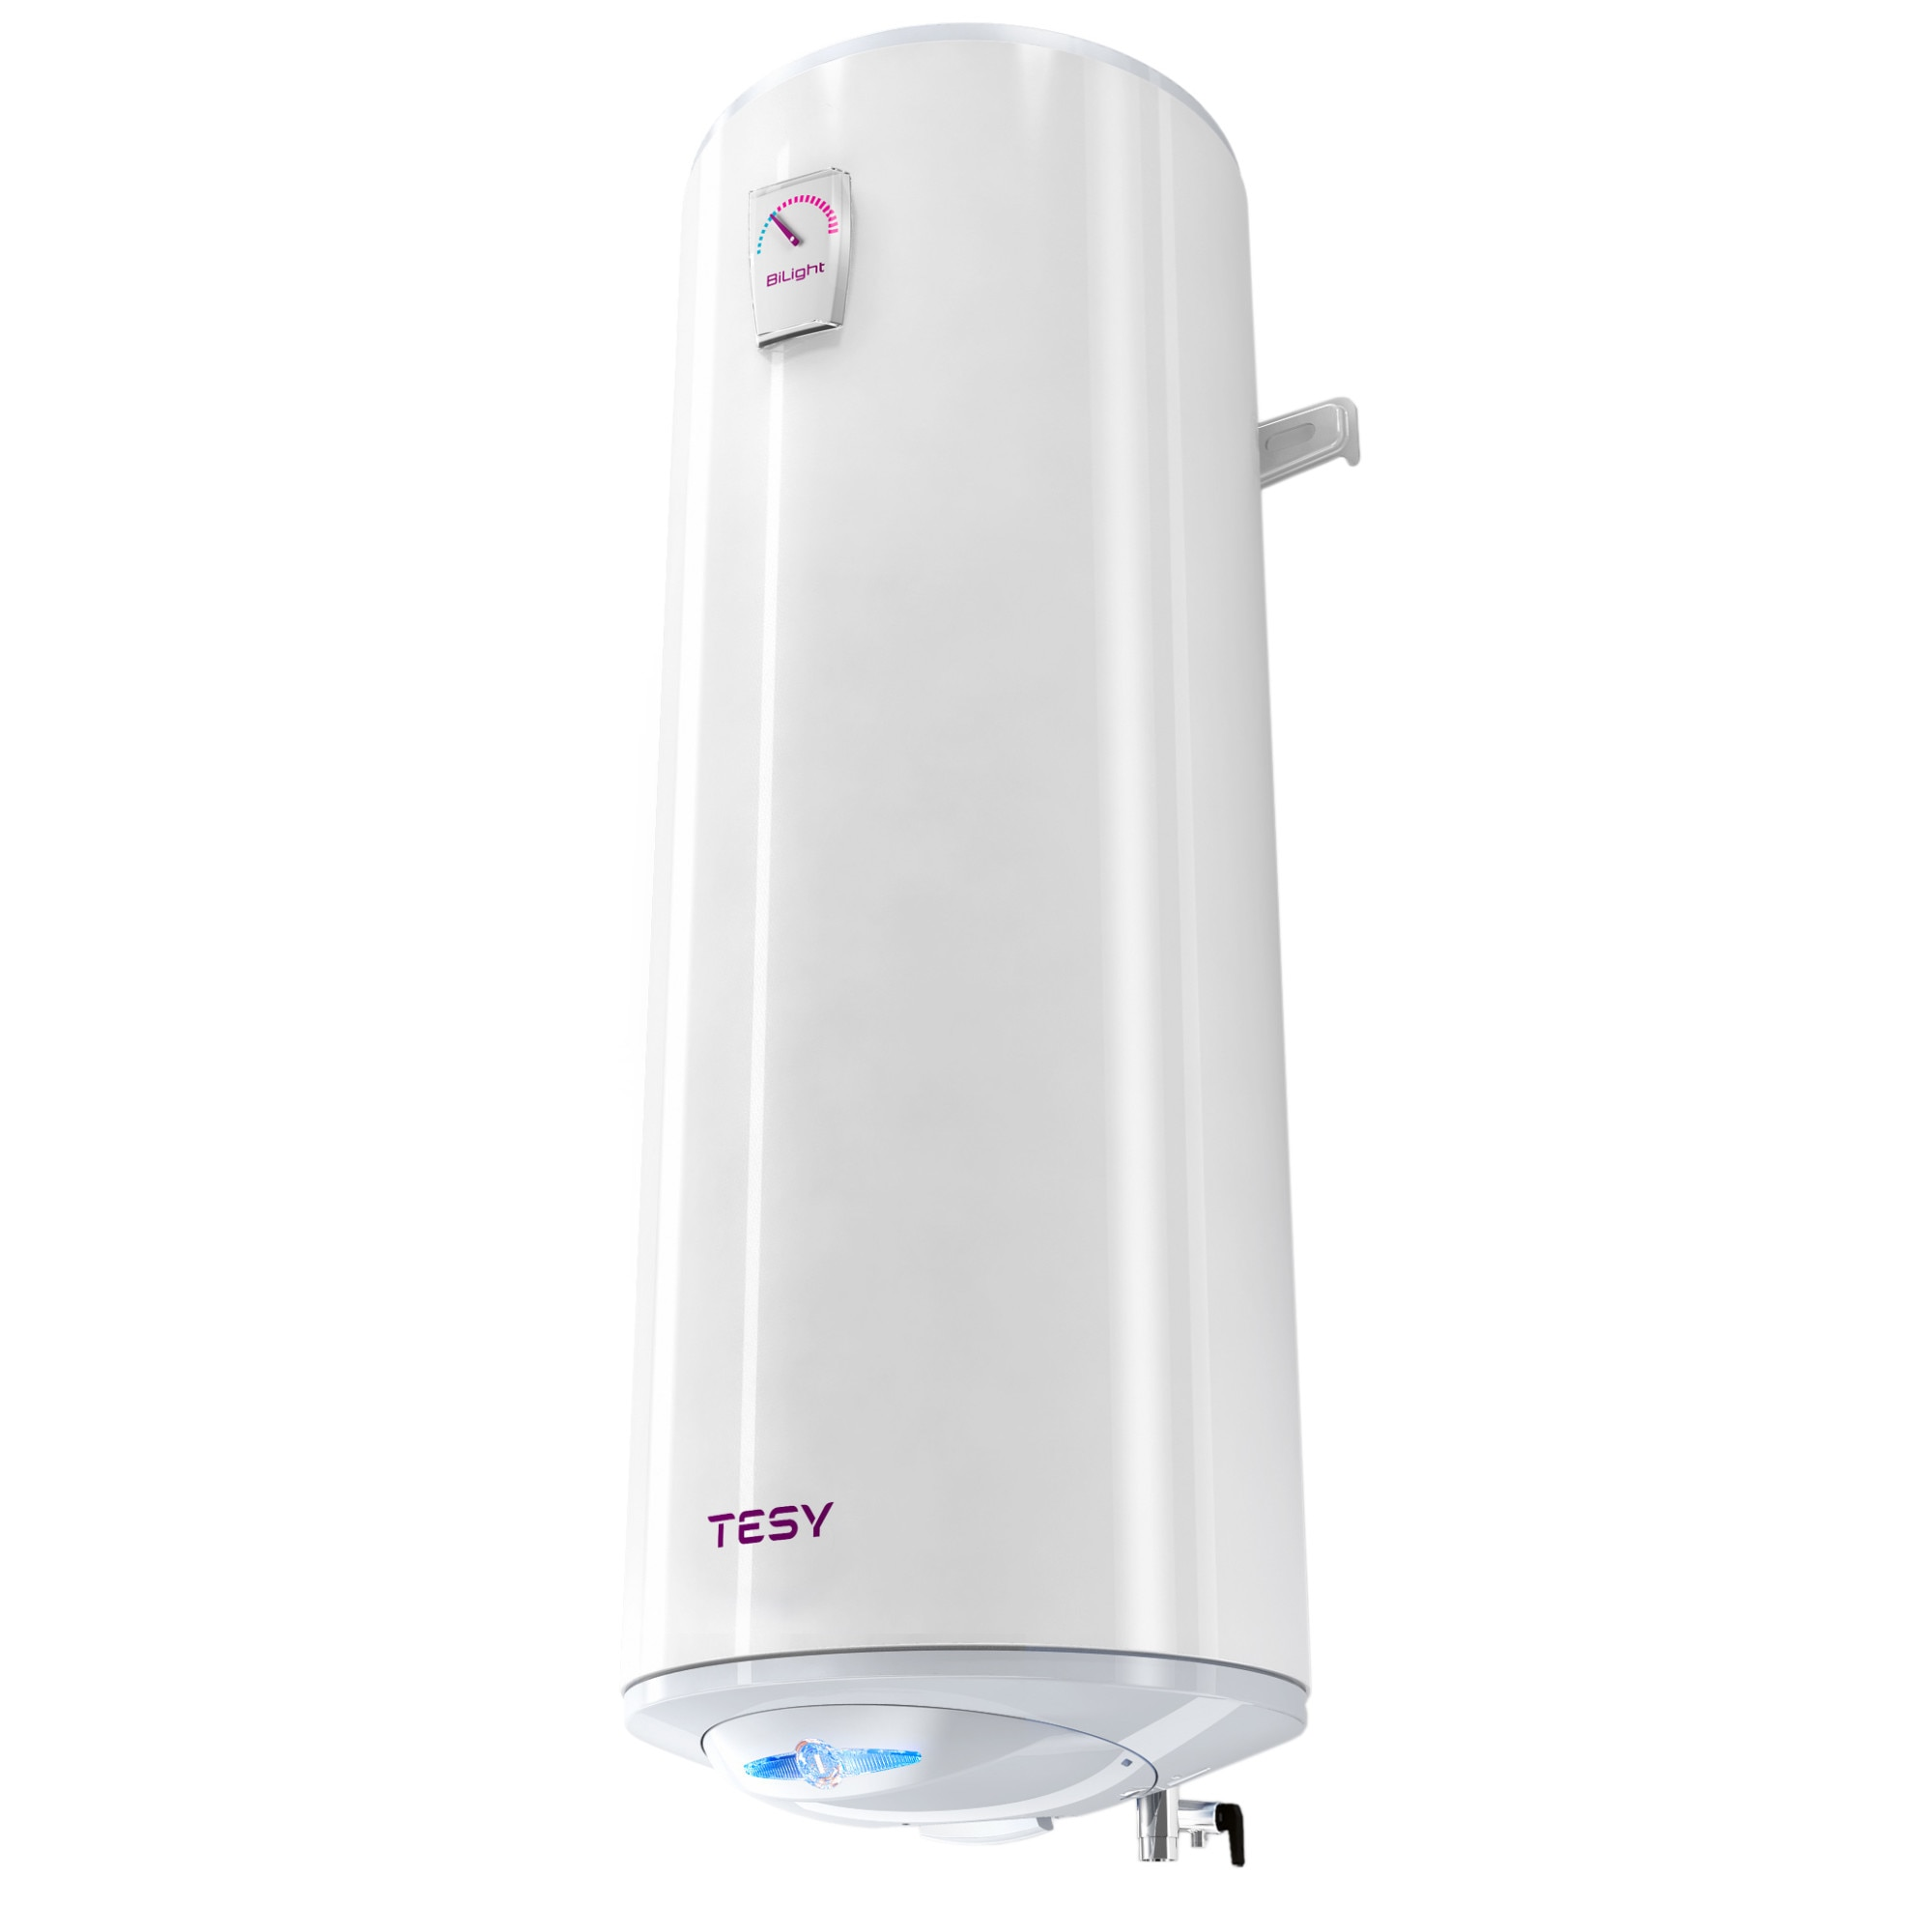 Fotografie Boiler electric Tesy BiLight SLIM GCV803820B11TSRC, 2000 W, 80 L, 0.8 Mpa, 34 mm, Protectie anti-inghet